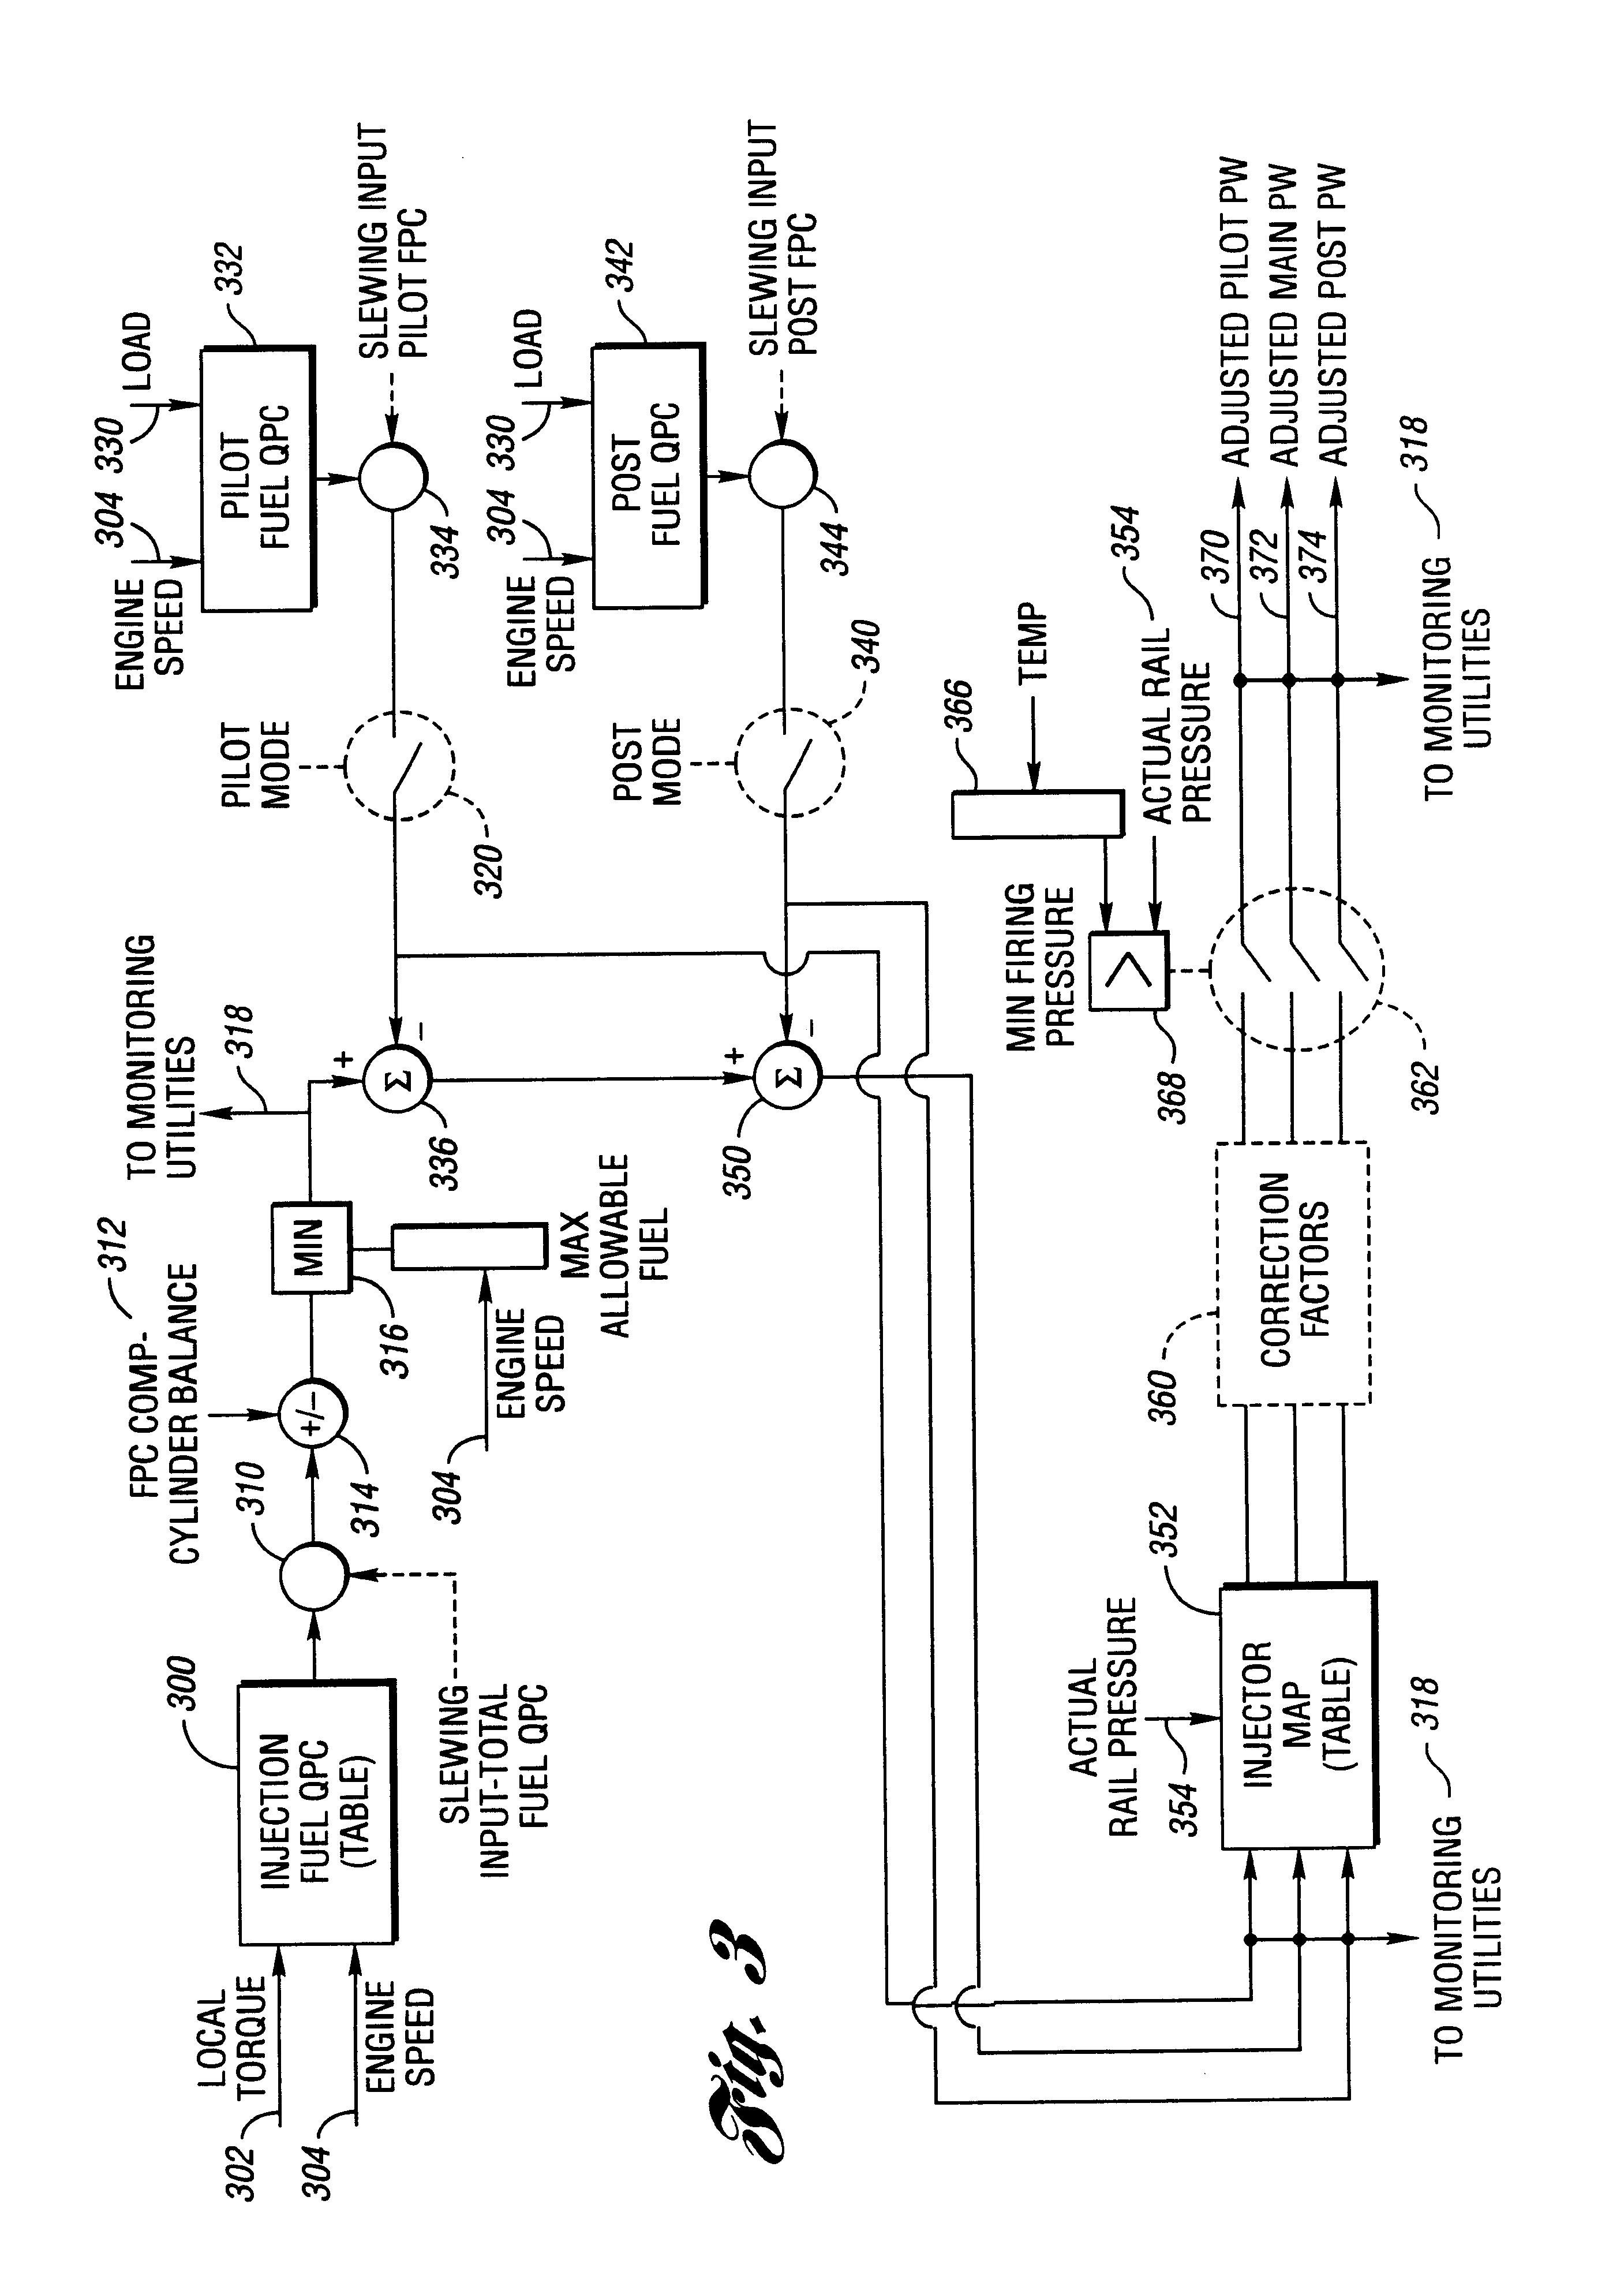 [SODI_2457]   FN_7750] Ih 584 Wiring Diagram Free Diagram | International 460 Wiring Diagram |  | Bachi Ginia Scoba Mohammedshrine Librar Wiring 101